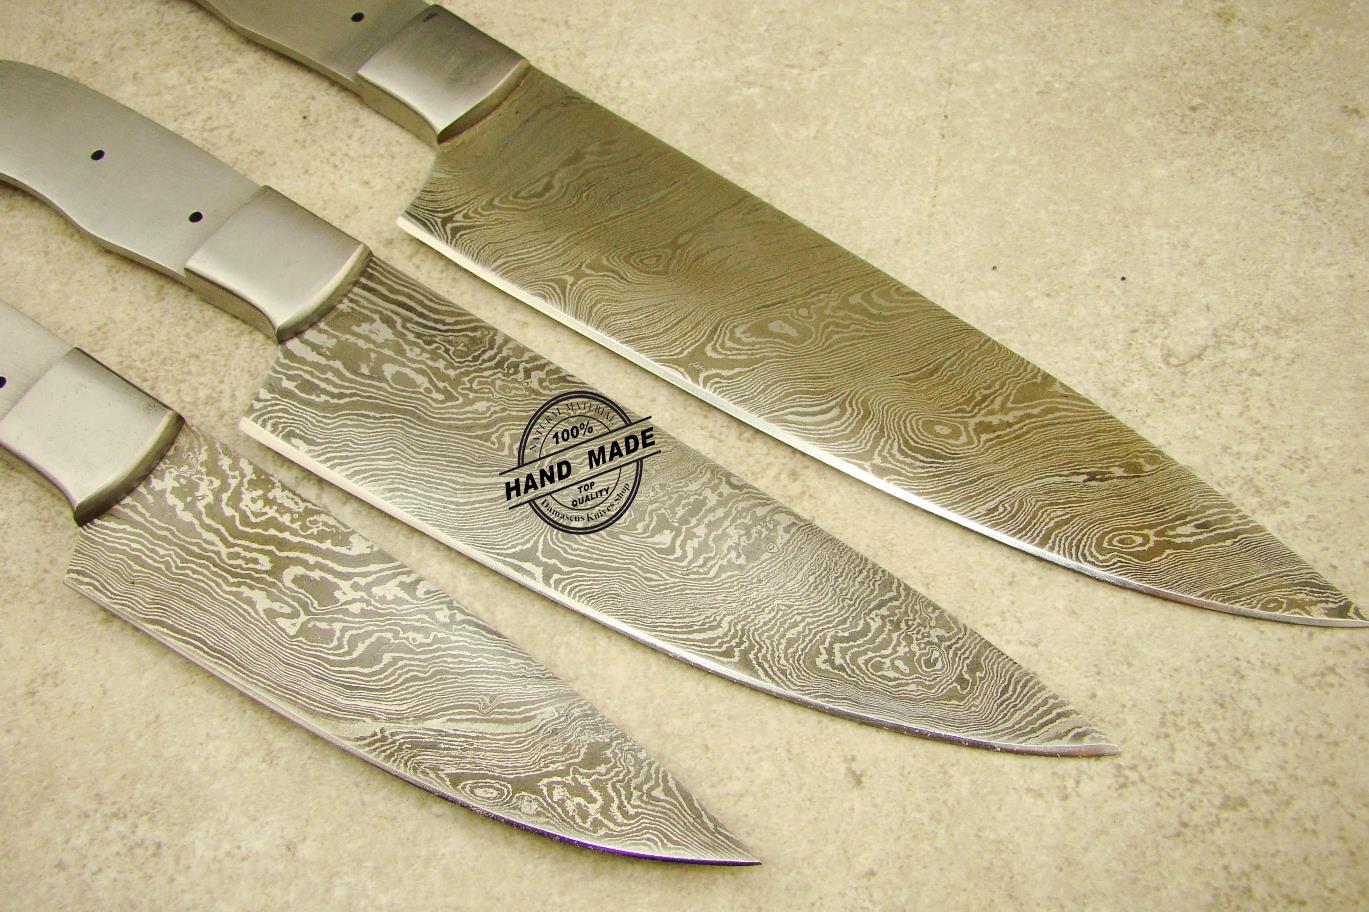 lot of 3 pcs professional chef knife blank blade custom handmade. Black Bedroom Furniture Sets. Home Design Ideas